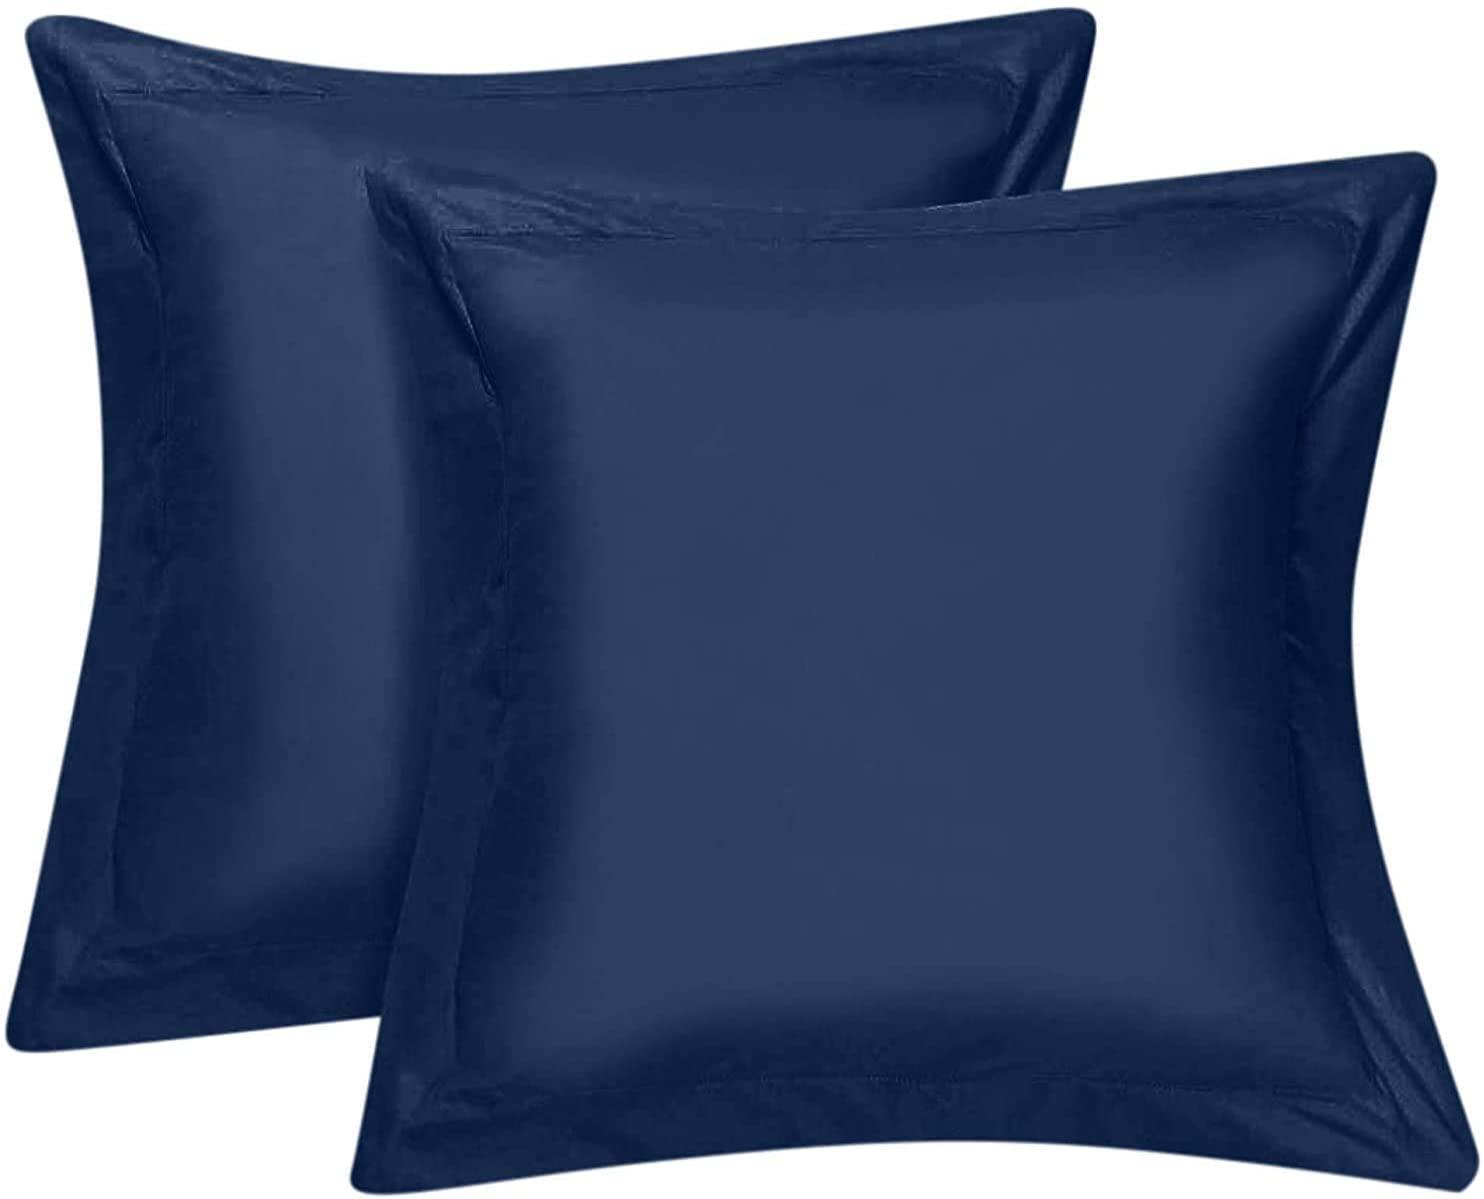 European Square Pillow Shams Set of 2-600 Thread Count 100% Natural Cotton European 24x24 Navy Blue Euro Pillow Shams Cushion Cover Soft Decorative Bed Pillow Shams (Navy Blue,Euro 24x24)